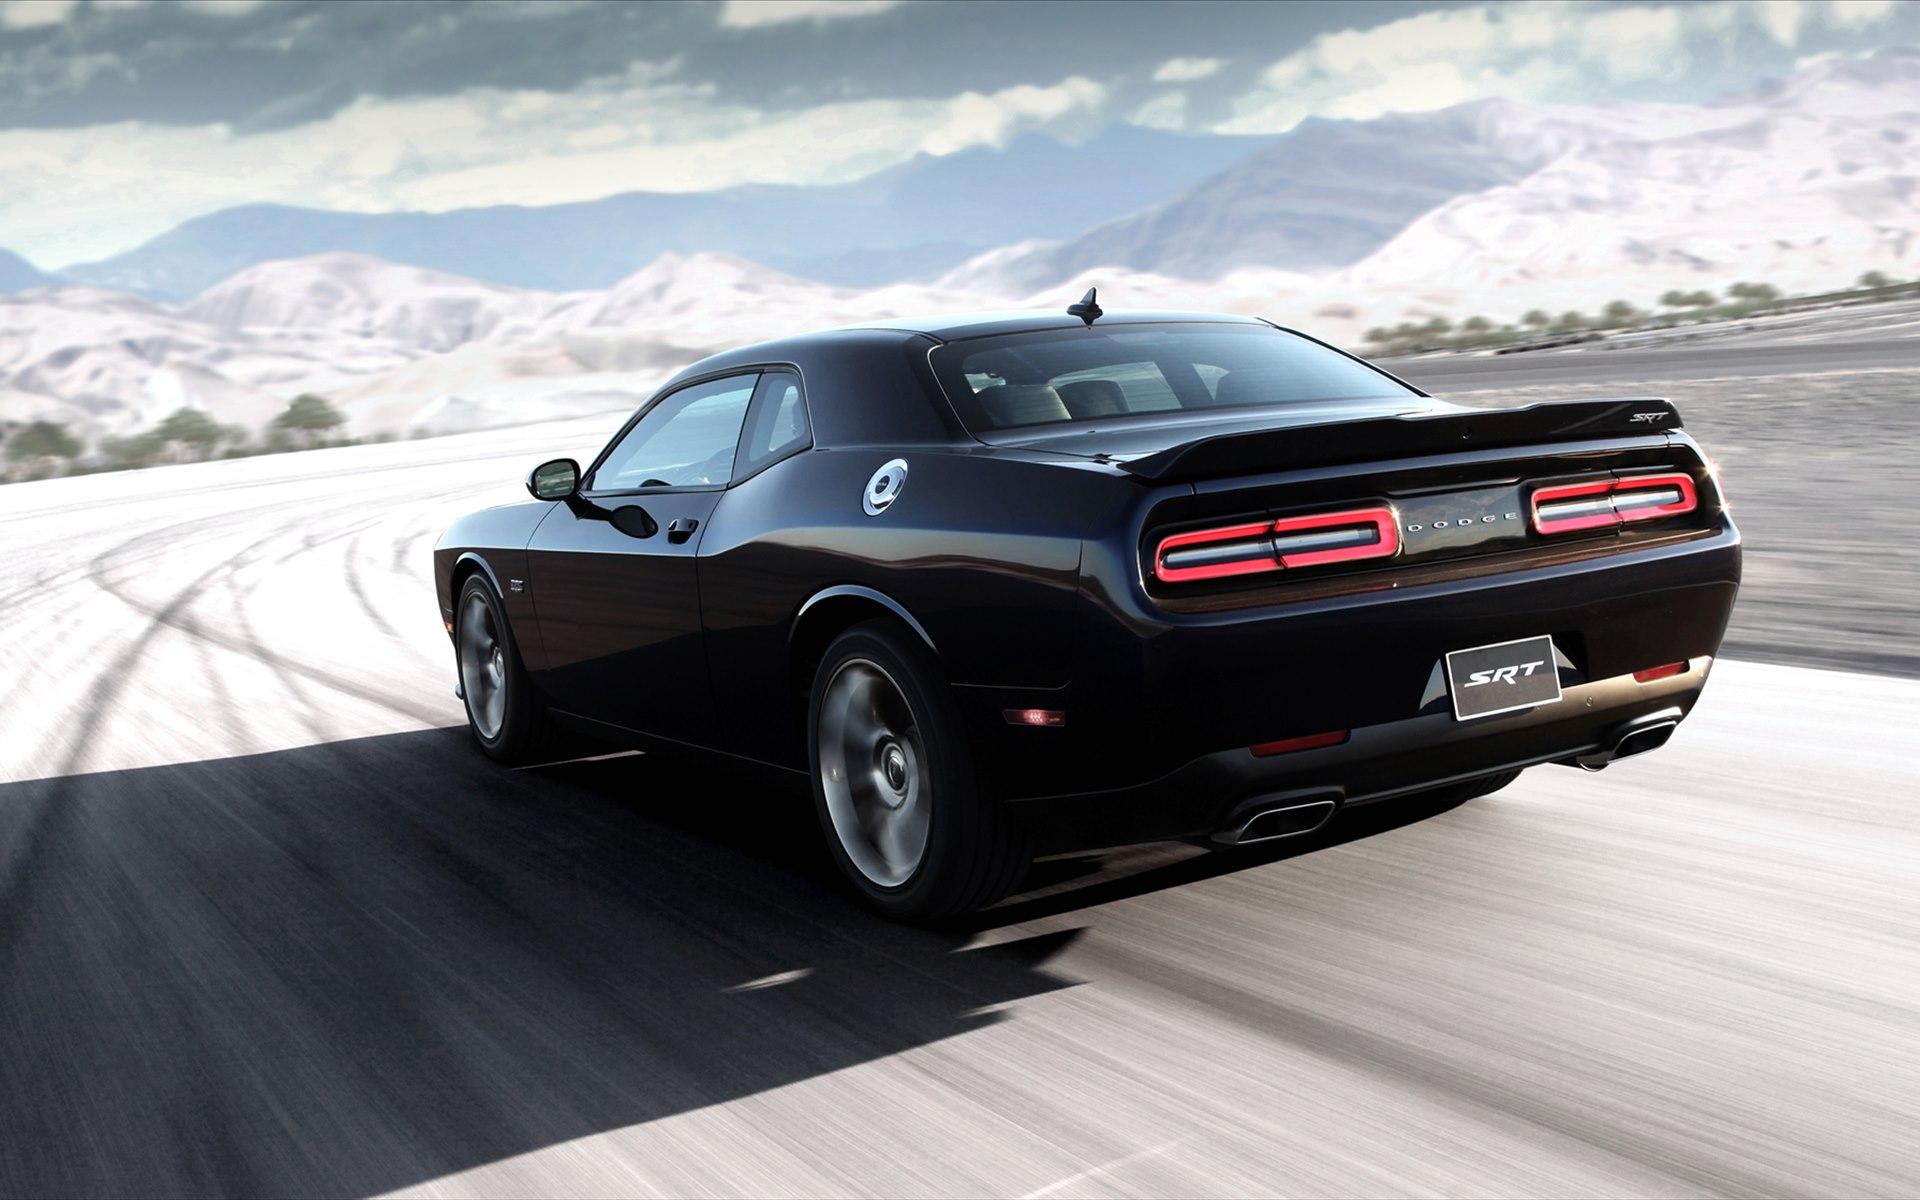 2015 Dodge Challenger 12 Wide Car Wallpaper ...